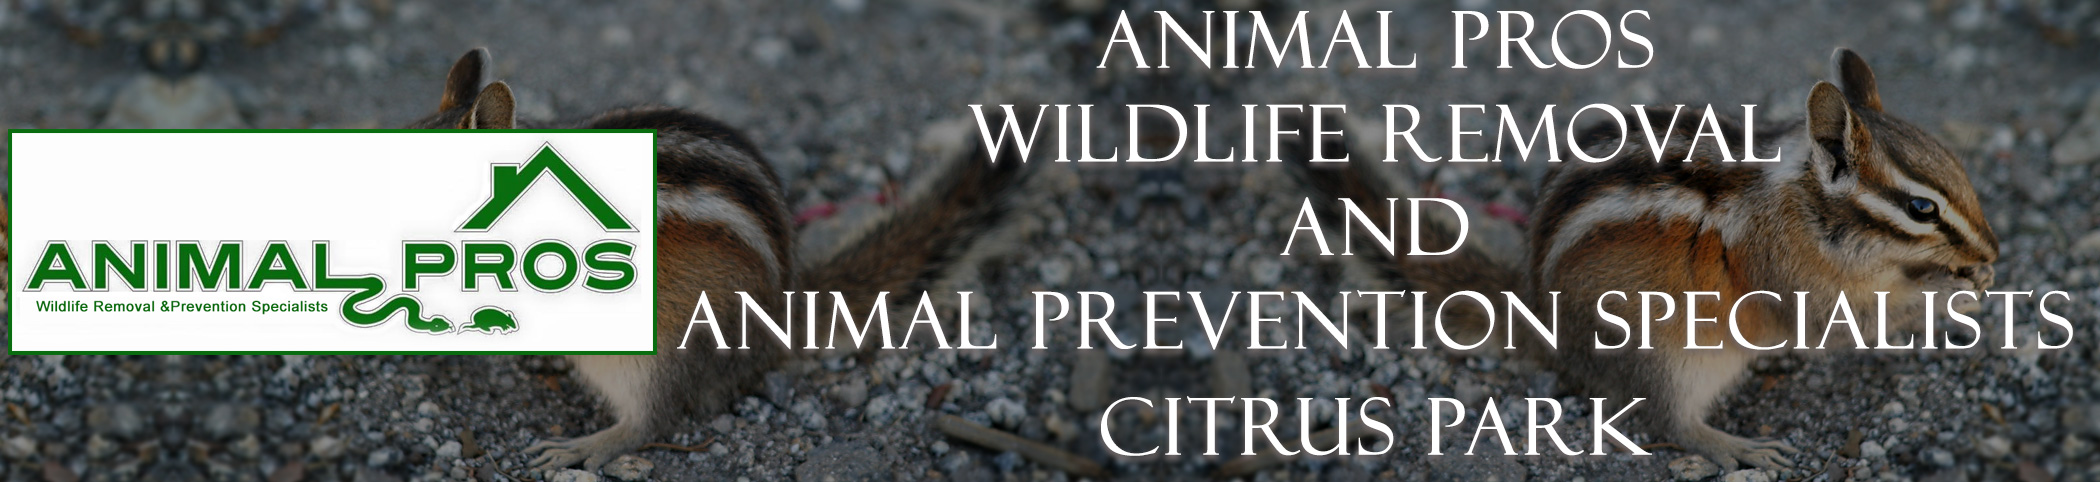 Animal Pros Citrus Park Florida Bat Removal And Wildlife Removal Header Image